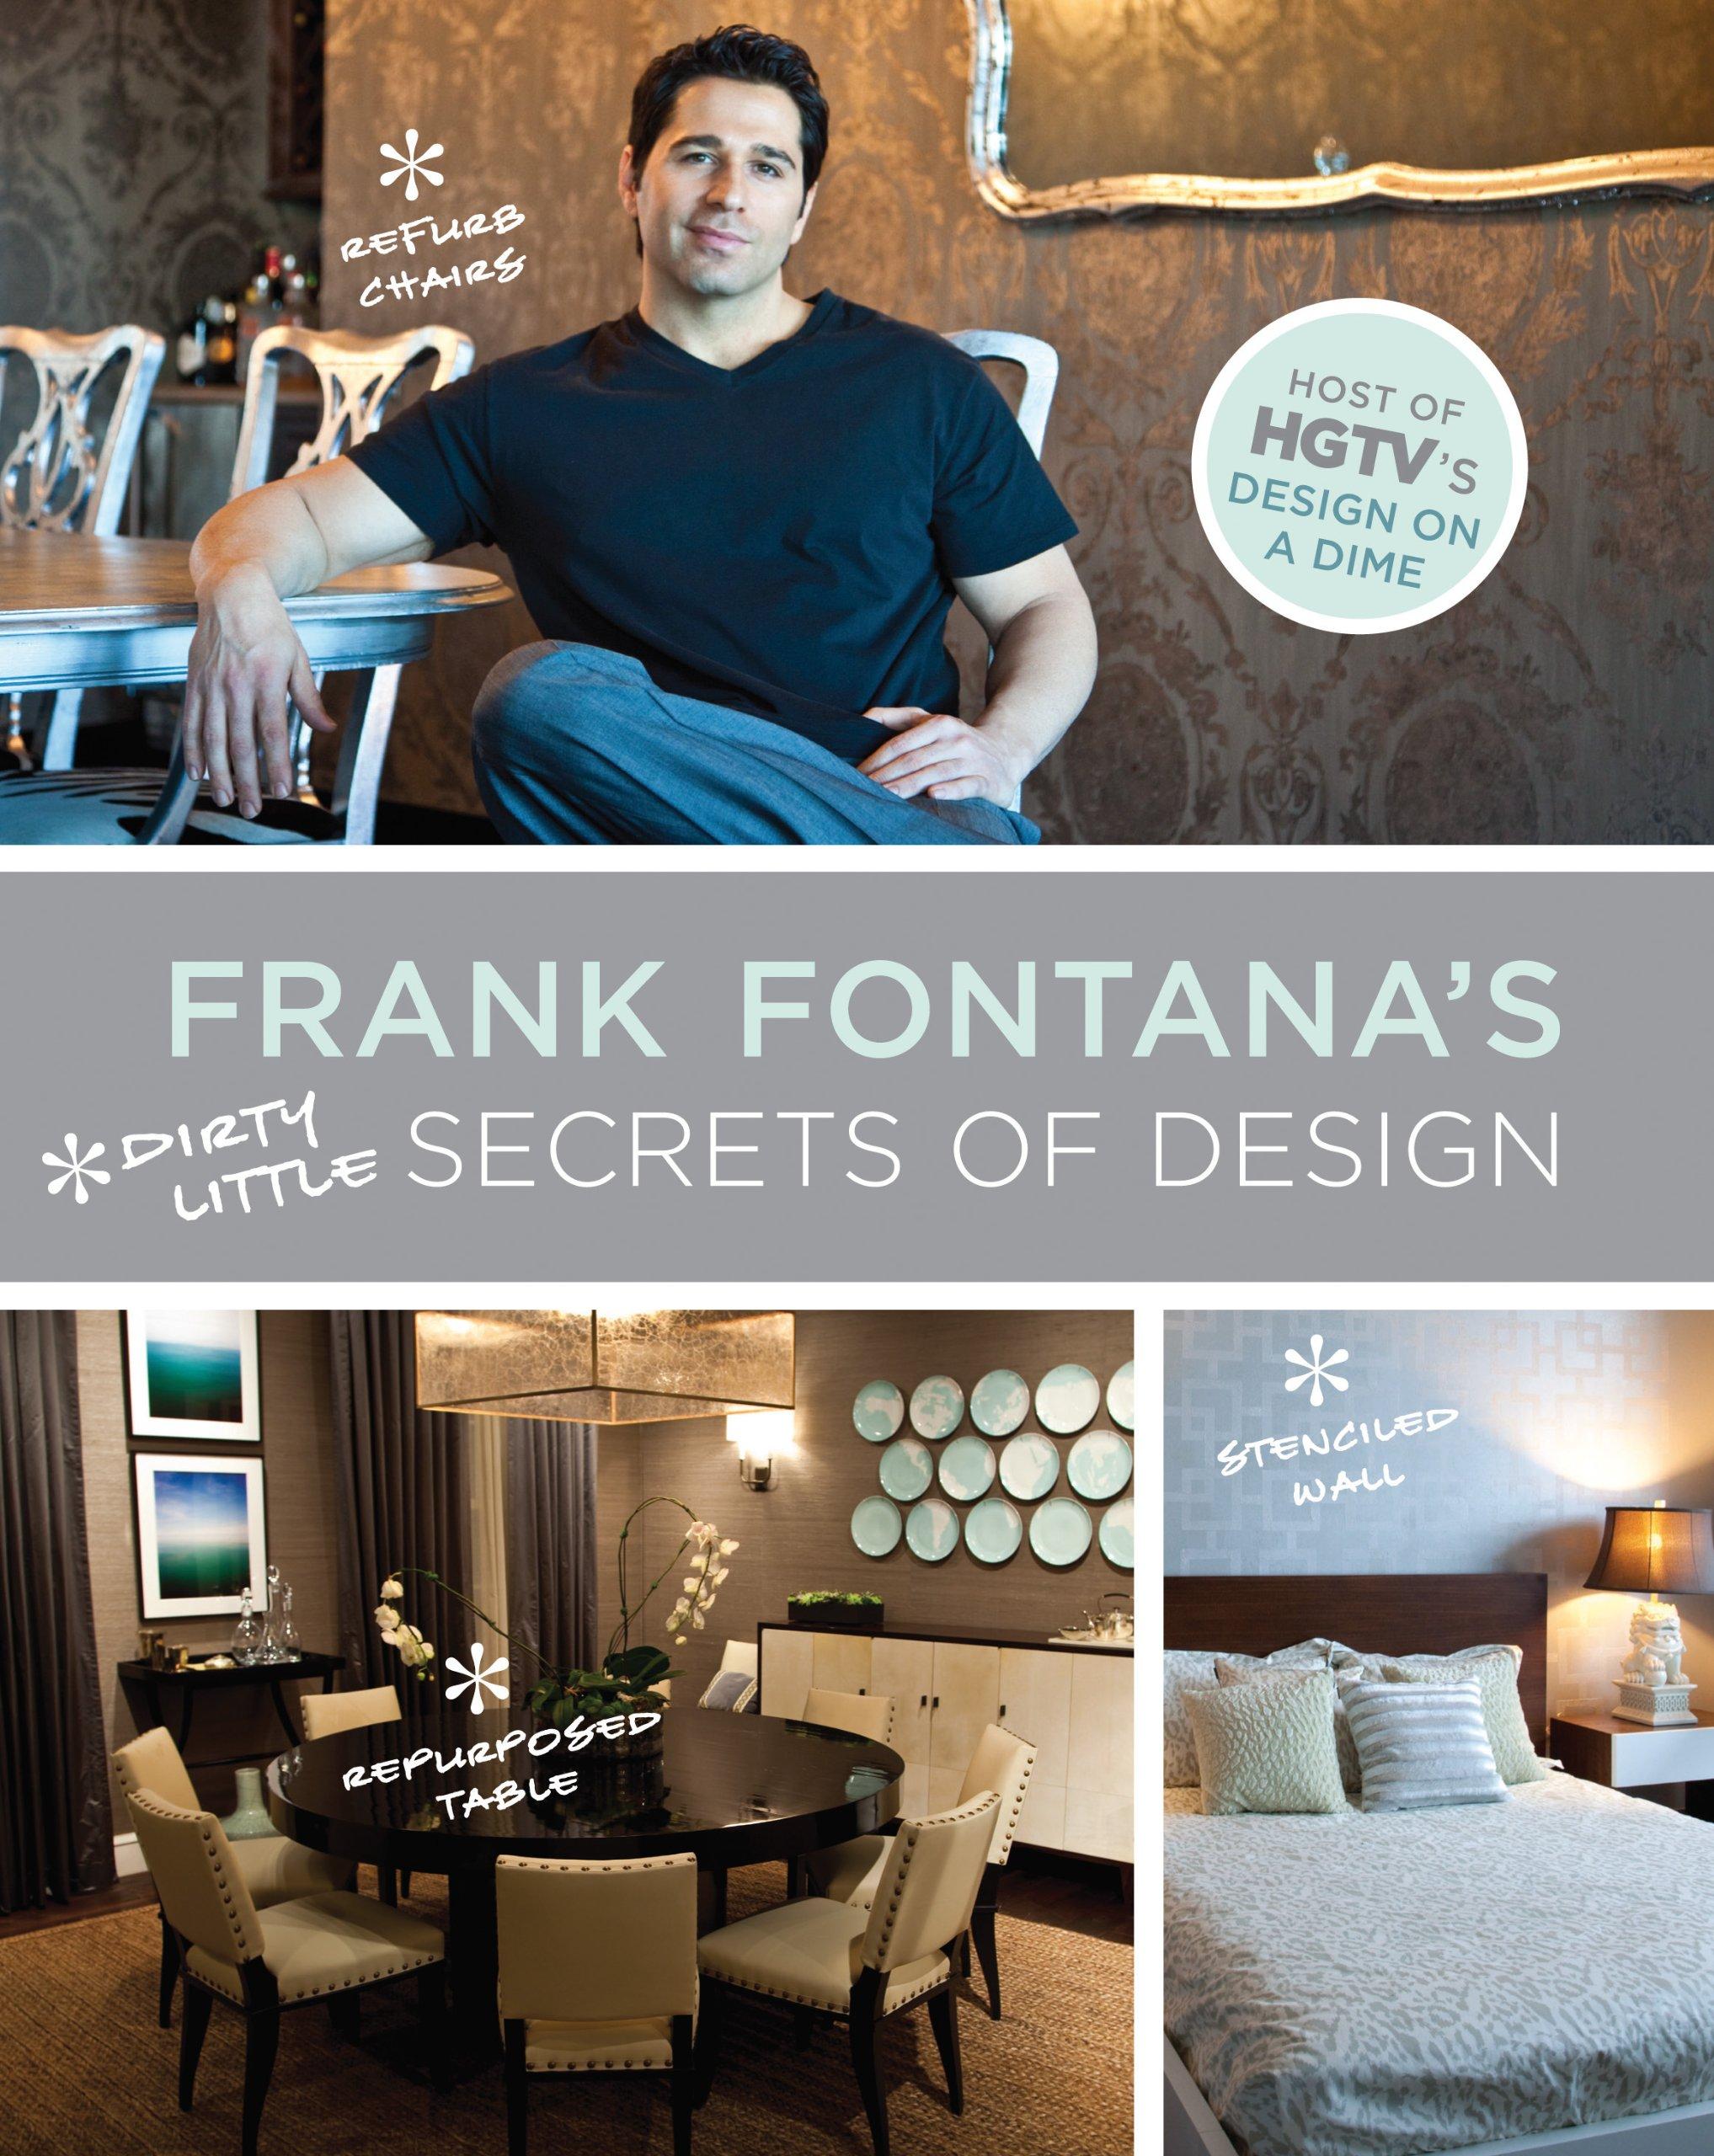 frank fontana s dirty little secrets of design frank fontana frank fontana s dirty little secrets of design frank fontana 9781584798552 amazon com books